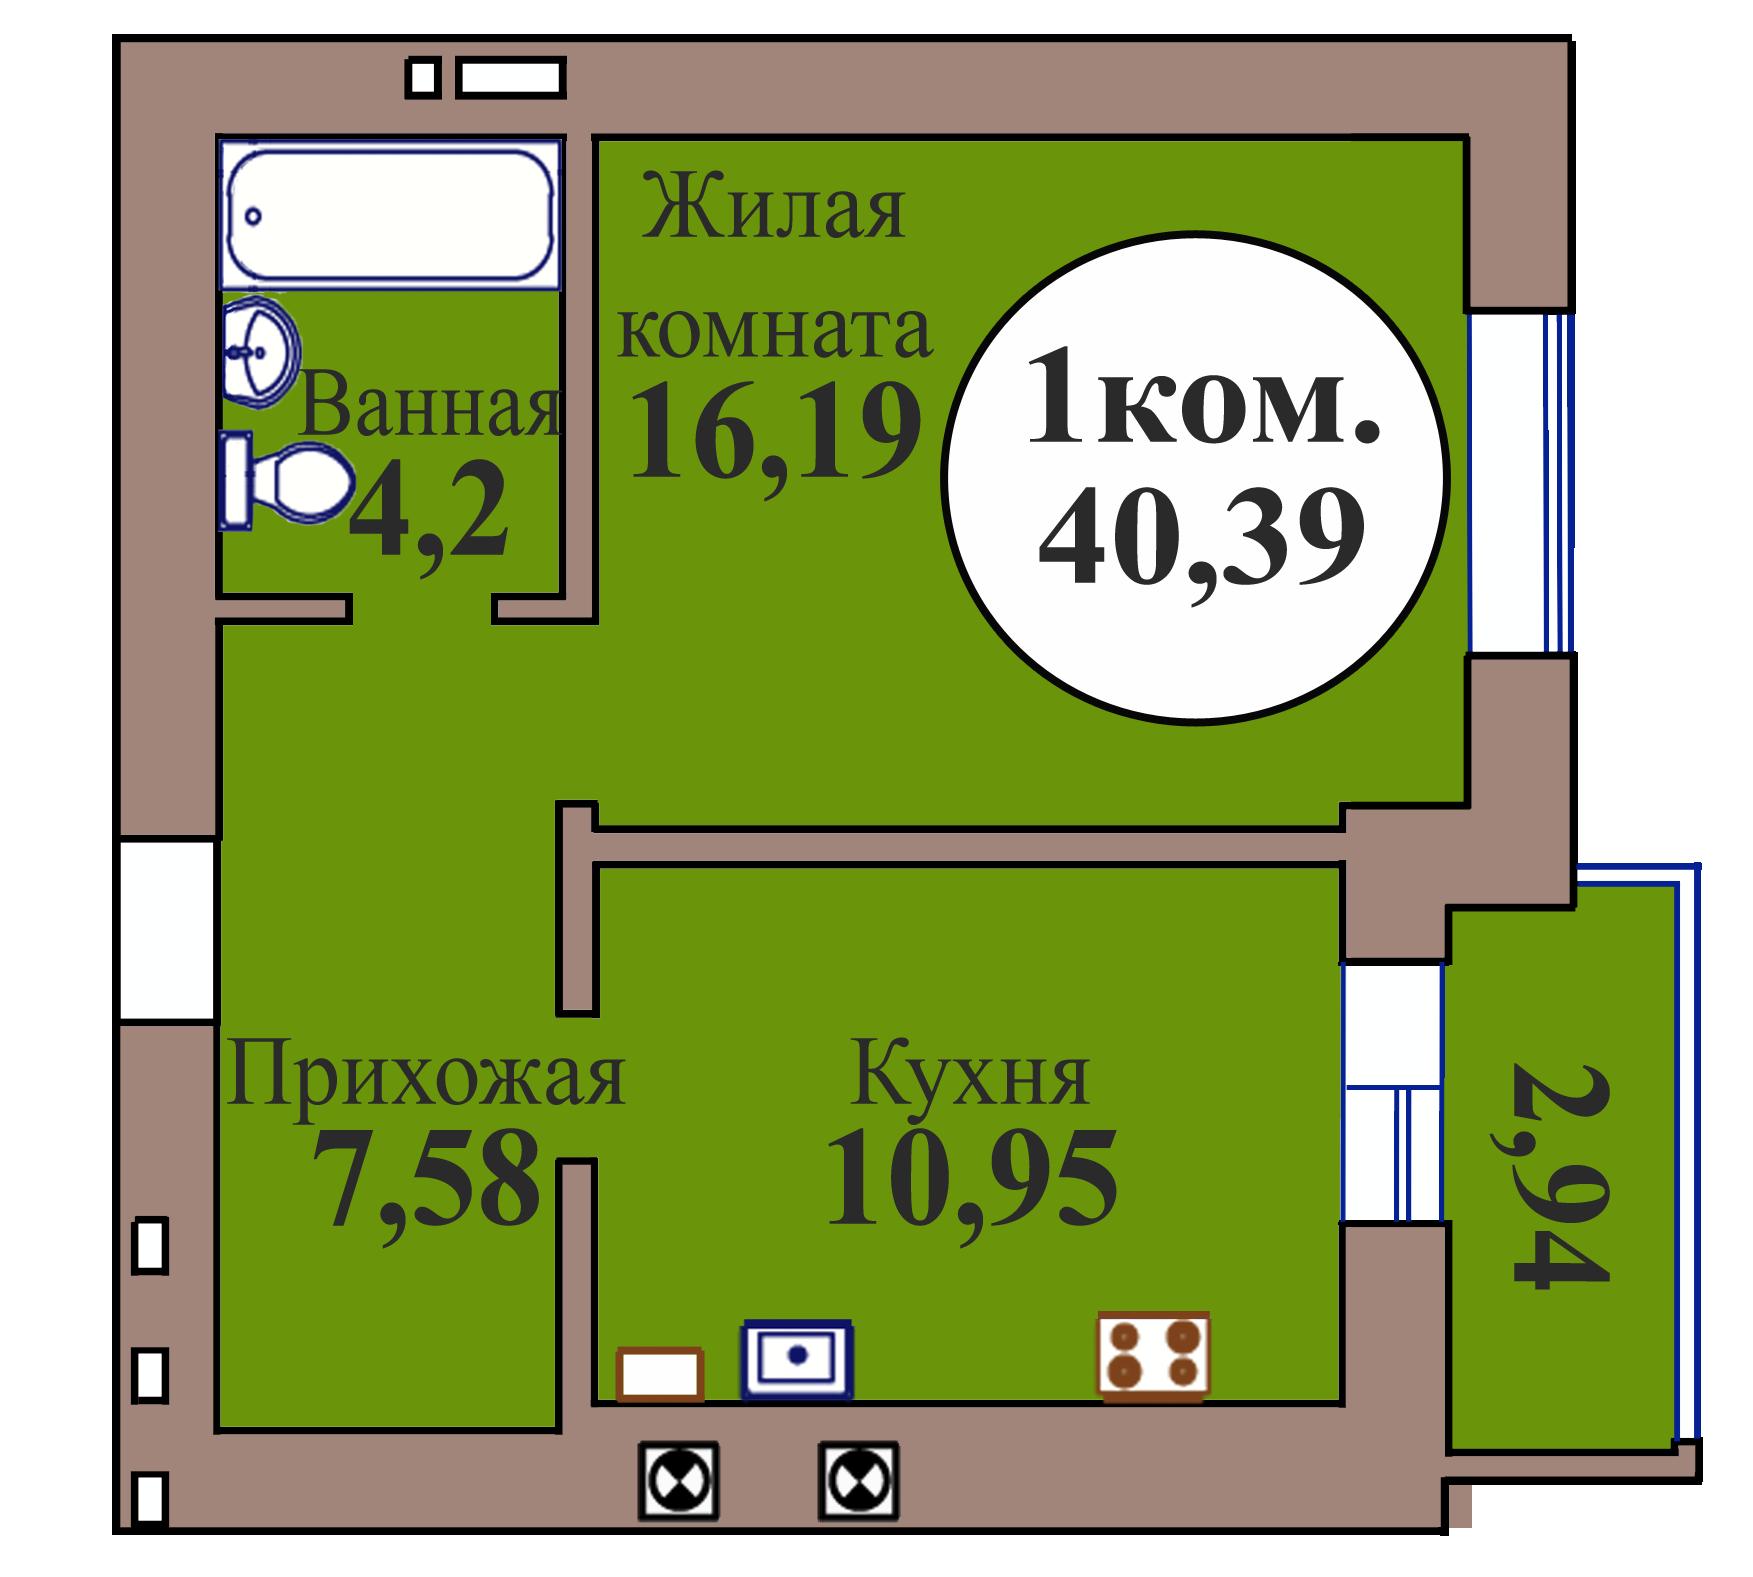 1-комн. кв. по ГП дом №3, МКР Васильково, кв. 123 в Калининграде